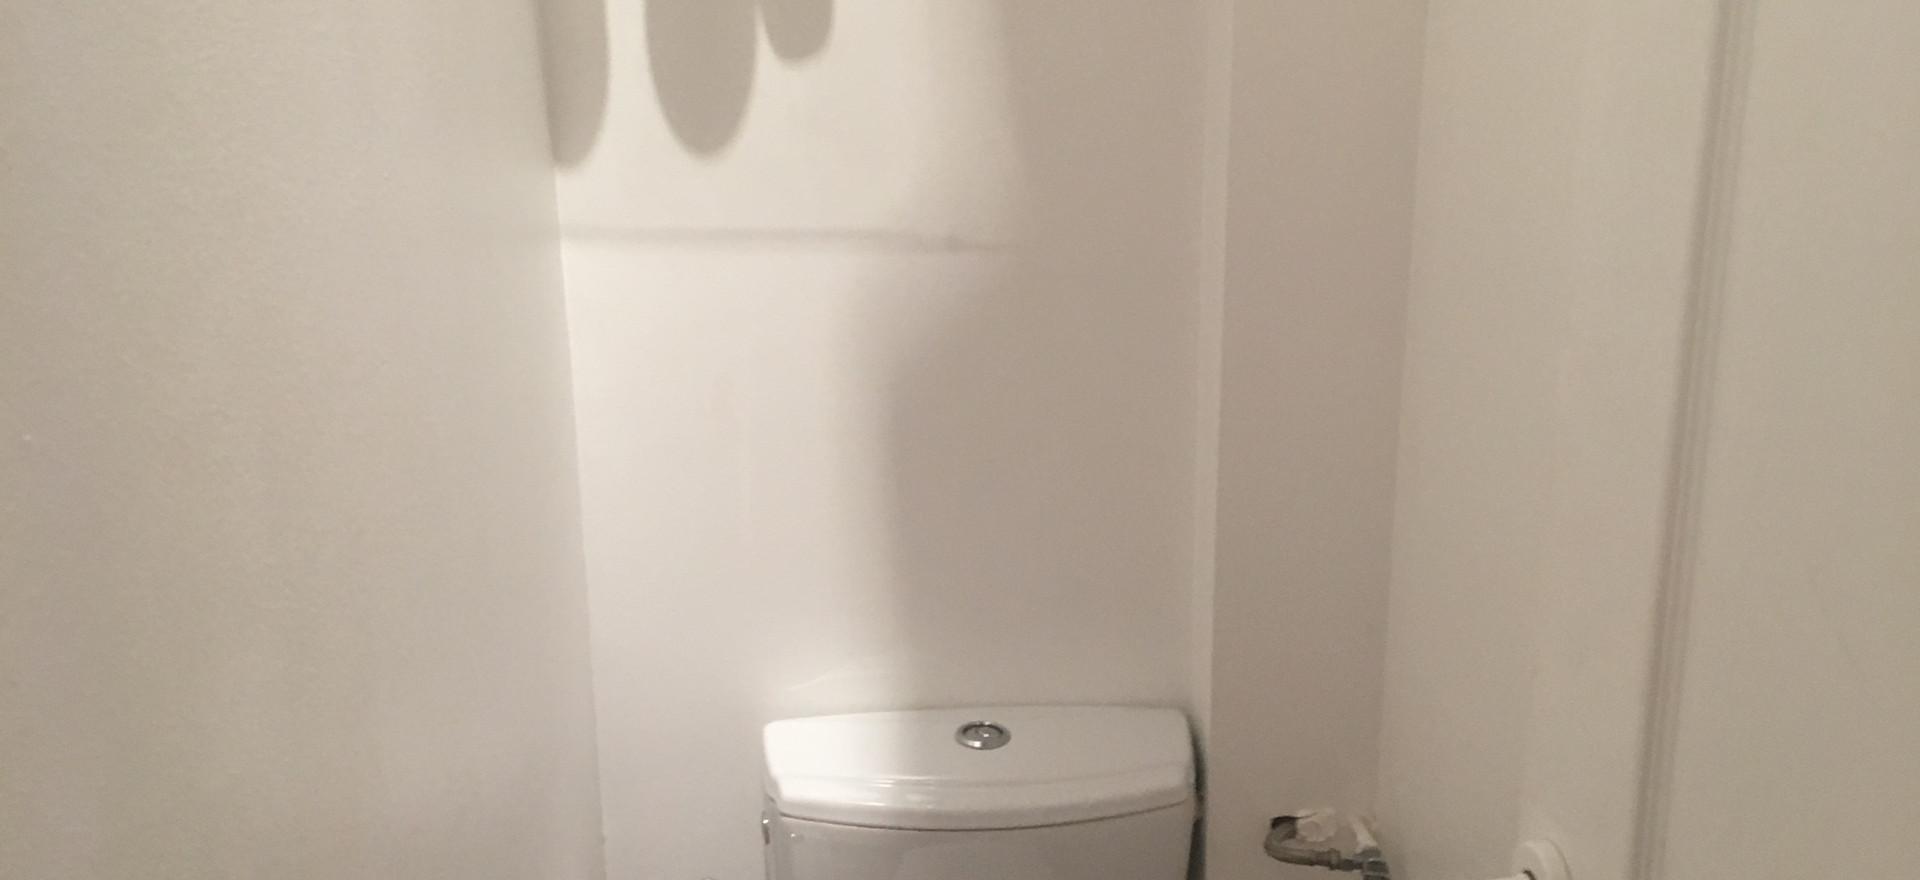 WC Haut